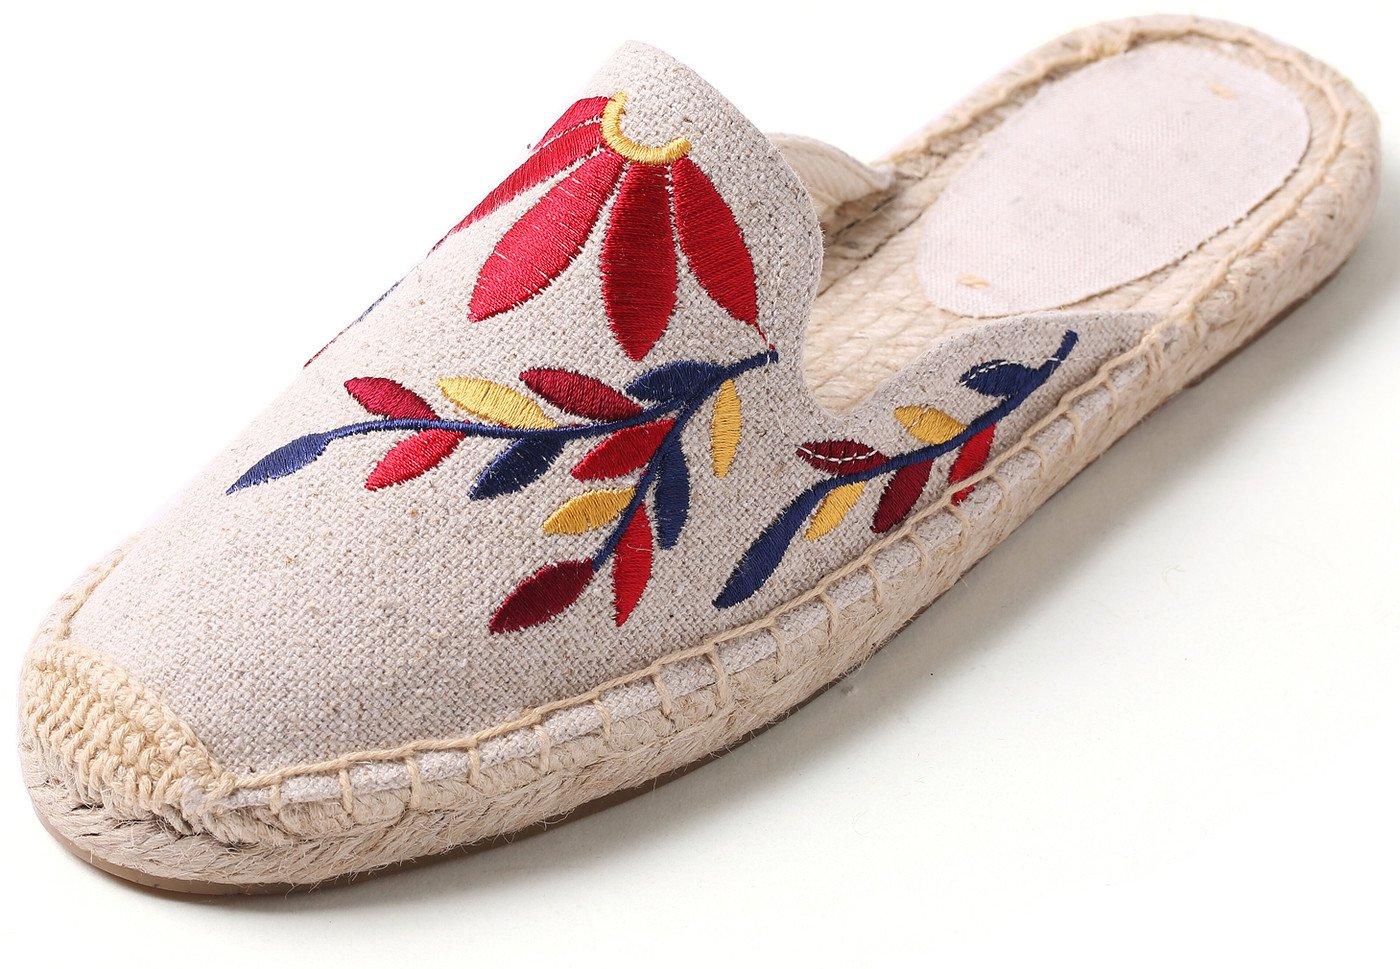 U-lite Women's Stylish Embroidery Leaf Flat Espadrilles Beige Colorful Leaf10